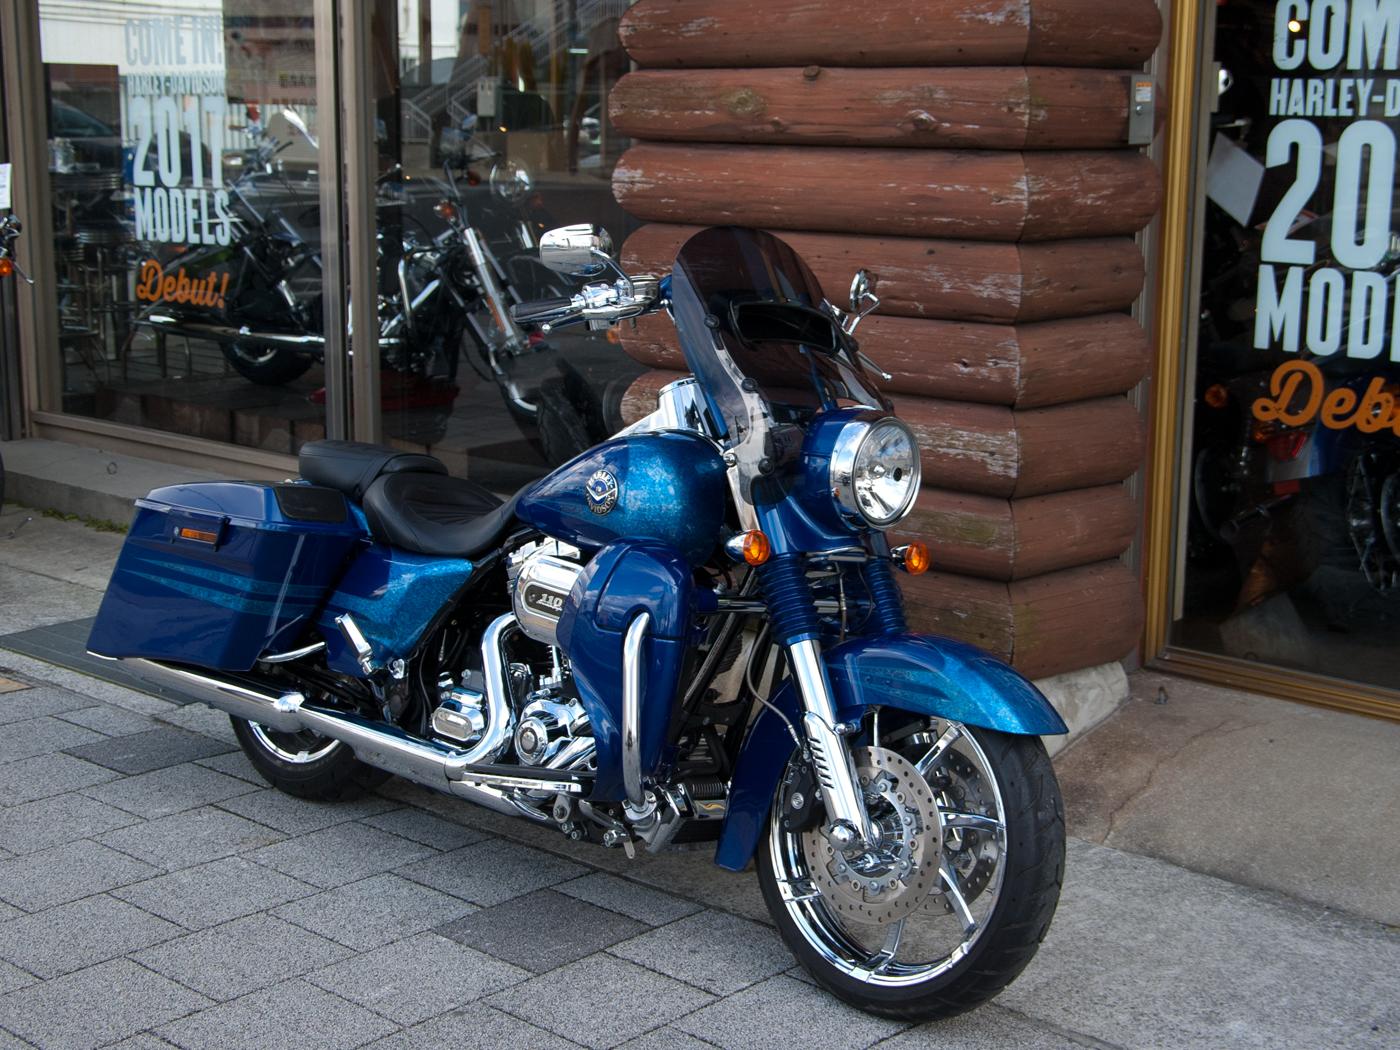 Harley-Davidson 2013 CVO Road King